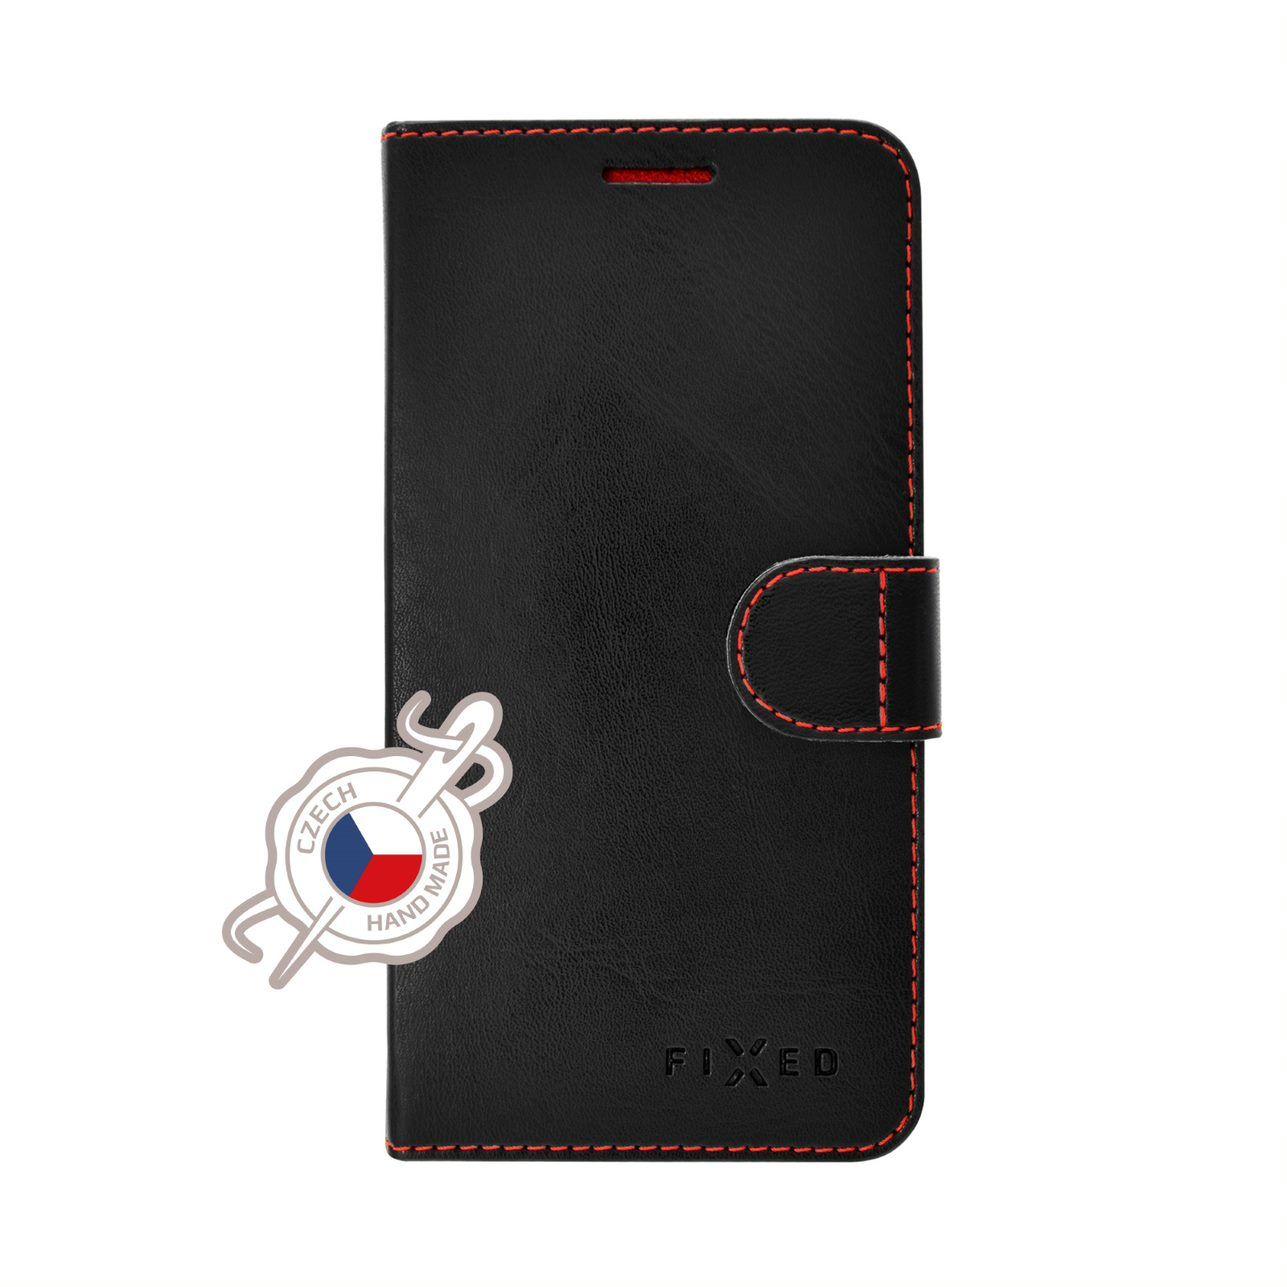 FIXED FIT flipové pouzdro pro Xiaomi Redmi Note 6 Pro, černé